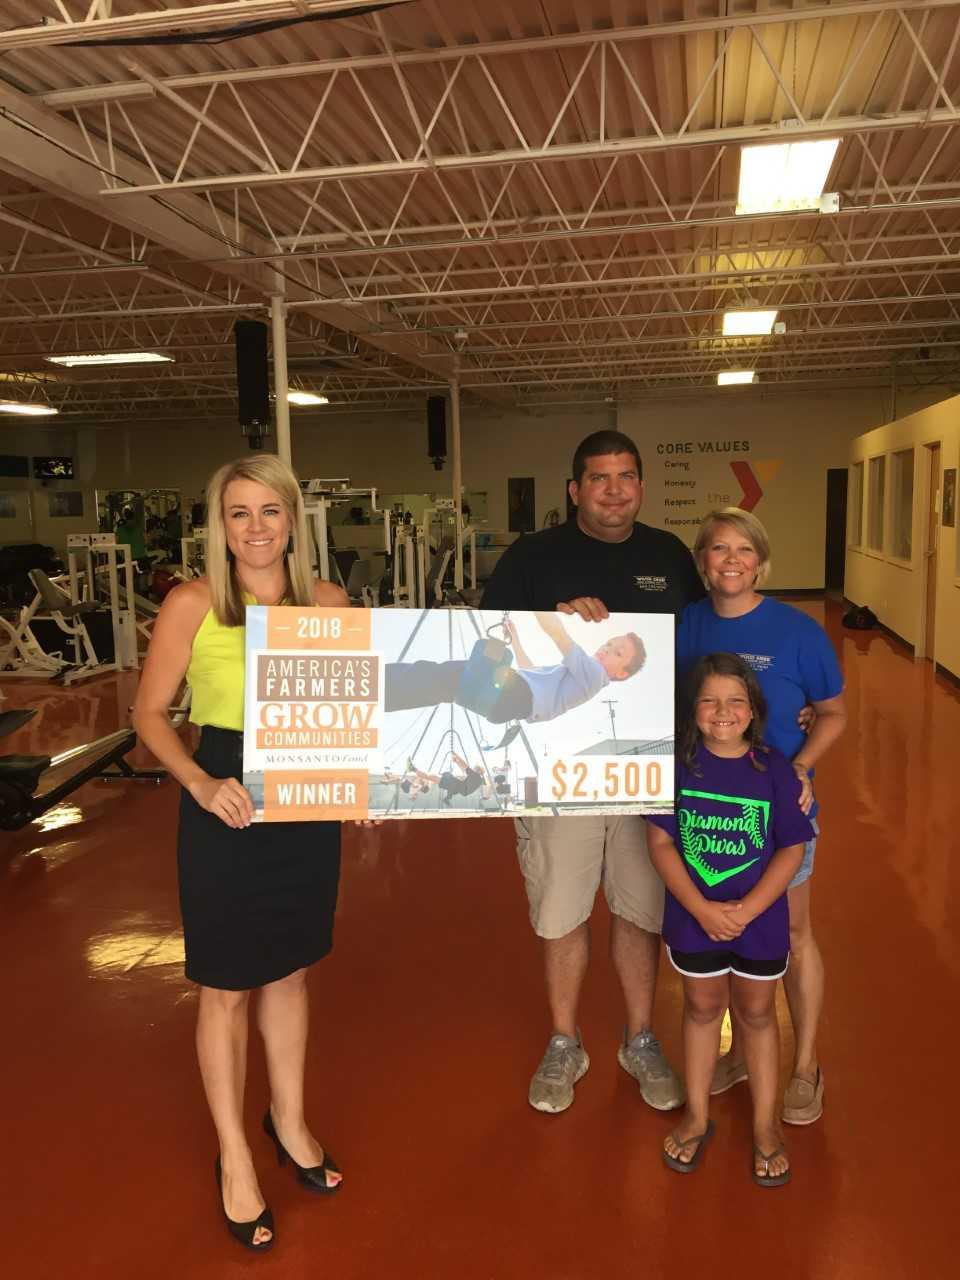 Carroll County Area YMCA awarded $2,500 donation from local Carrollton farmers